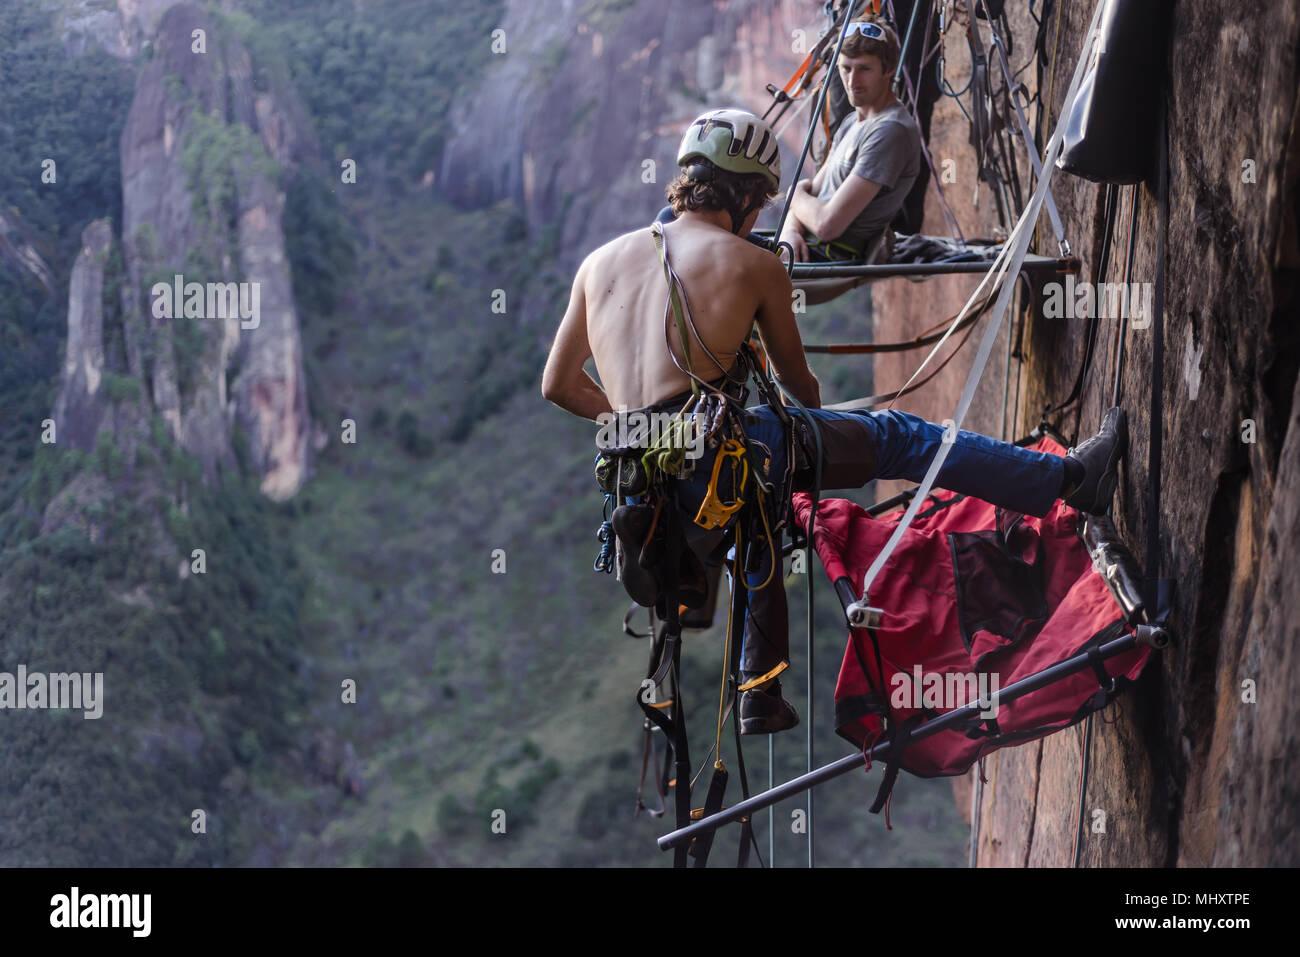 Rock climber securing portaledge, Liming, Yunnan Province, China - Stock Image